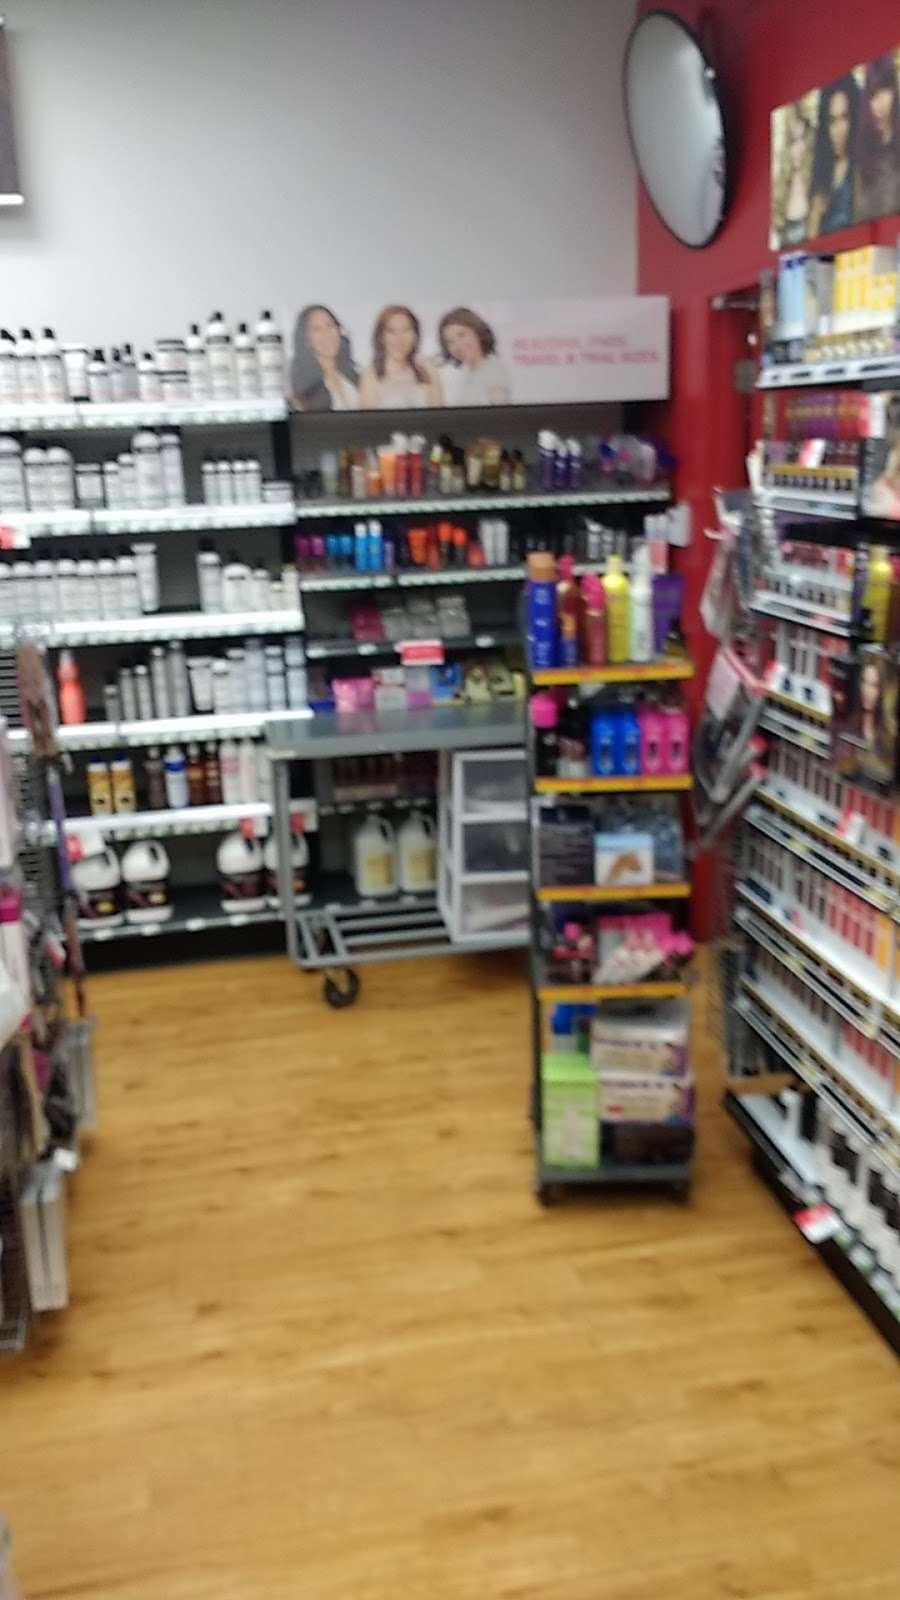 Sally Beauty - store  | Photo 6 of 9 | Address: 20260 N 59th Ave #101a, Glendale, AZ 85308, USA | Phone: (623) 362-8141